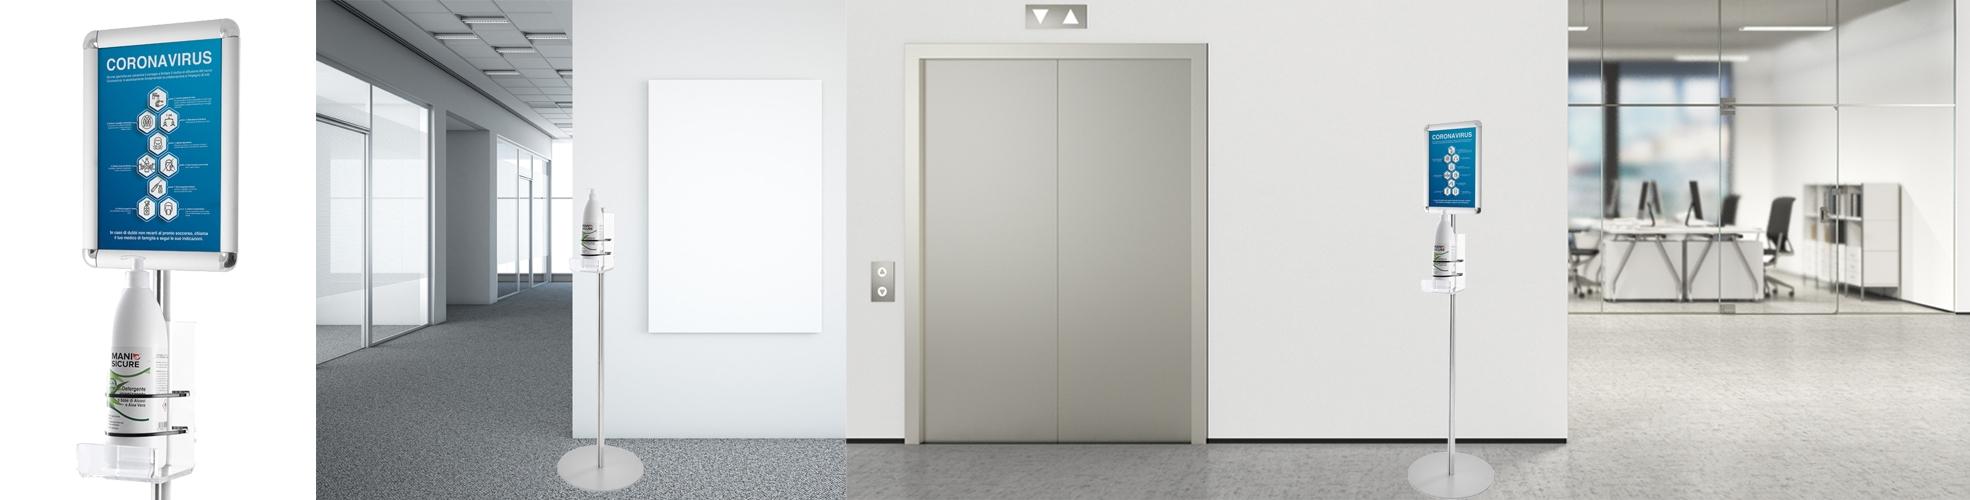 Porta dispenser per igienizzanti